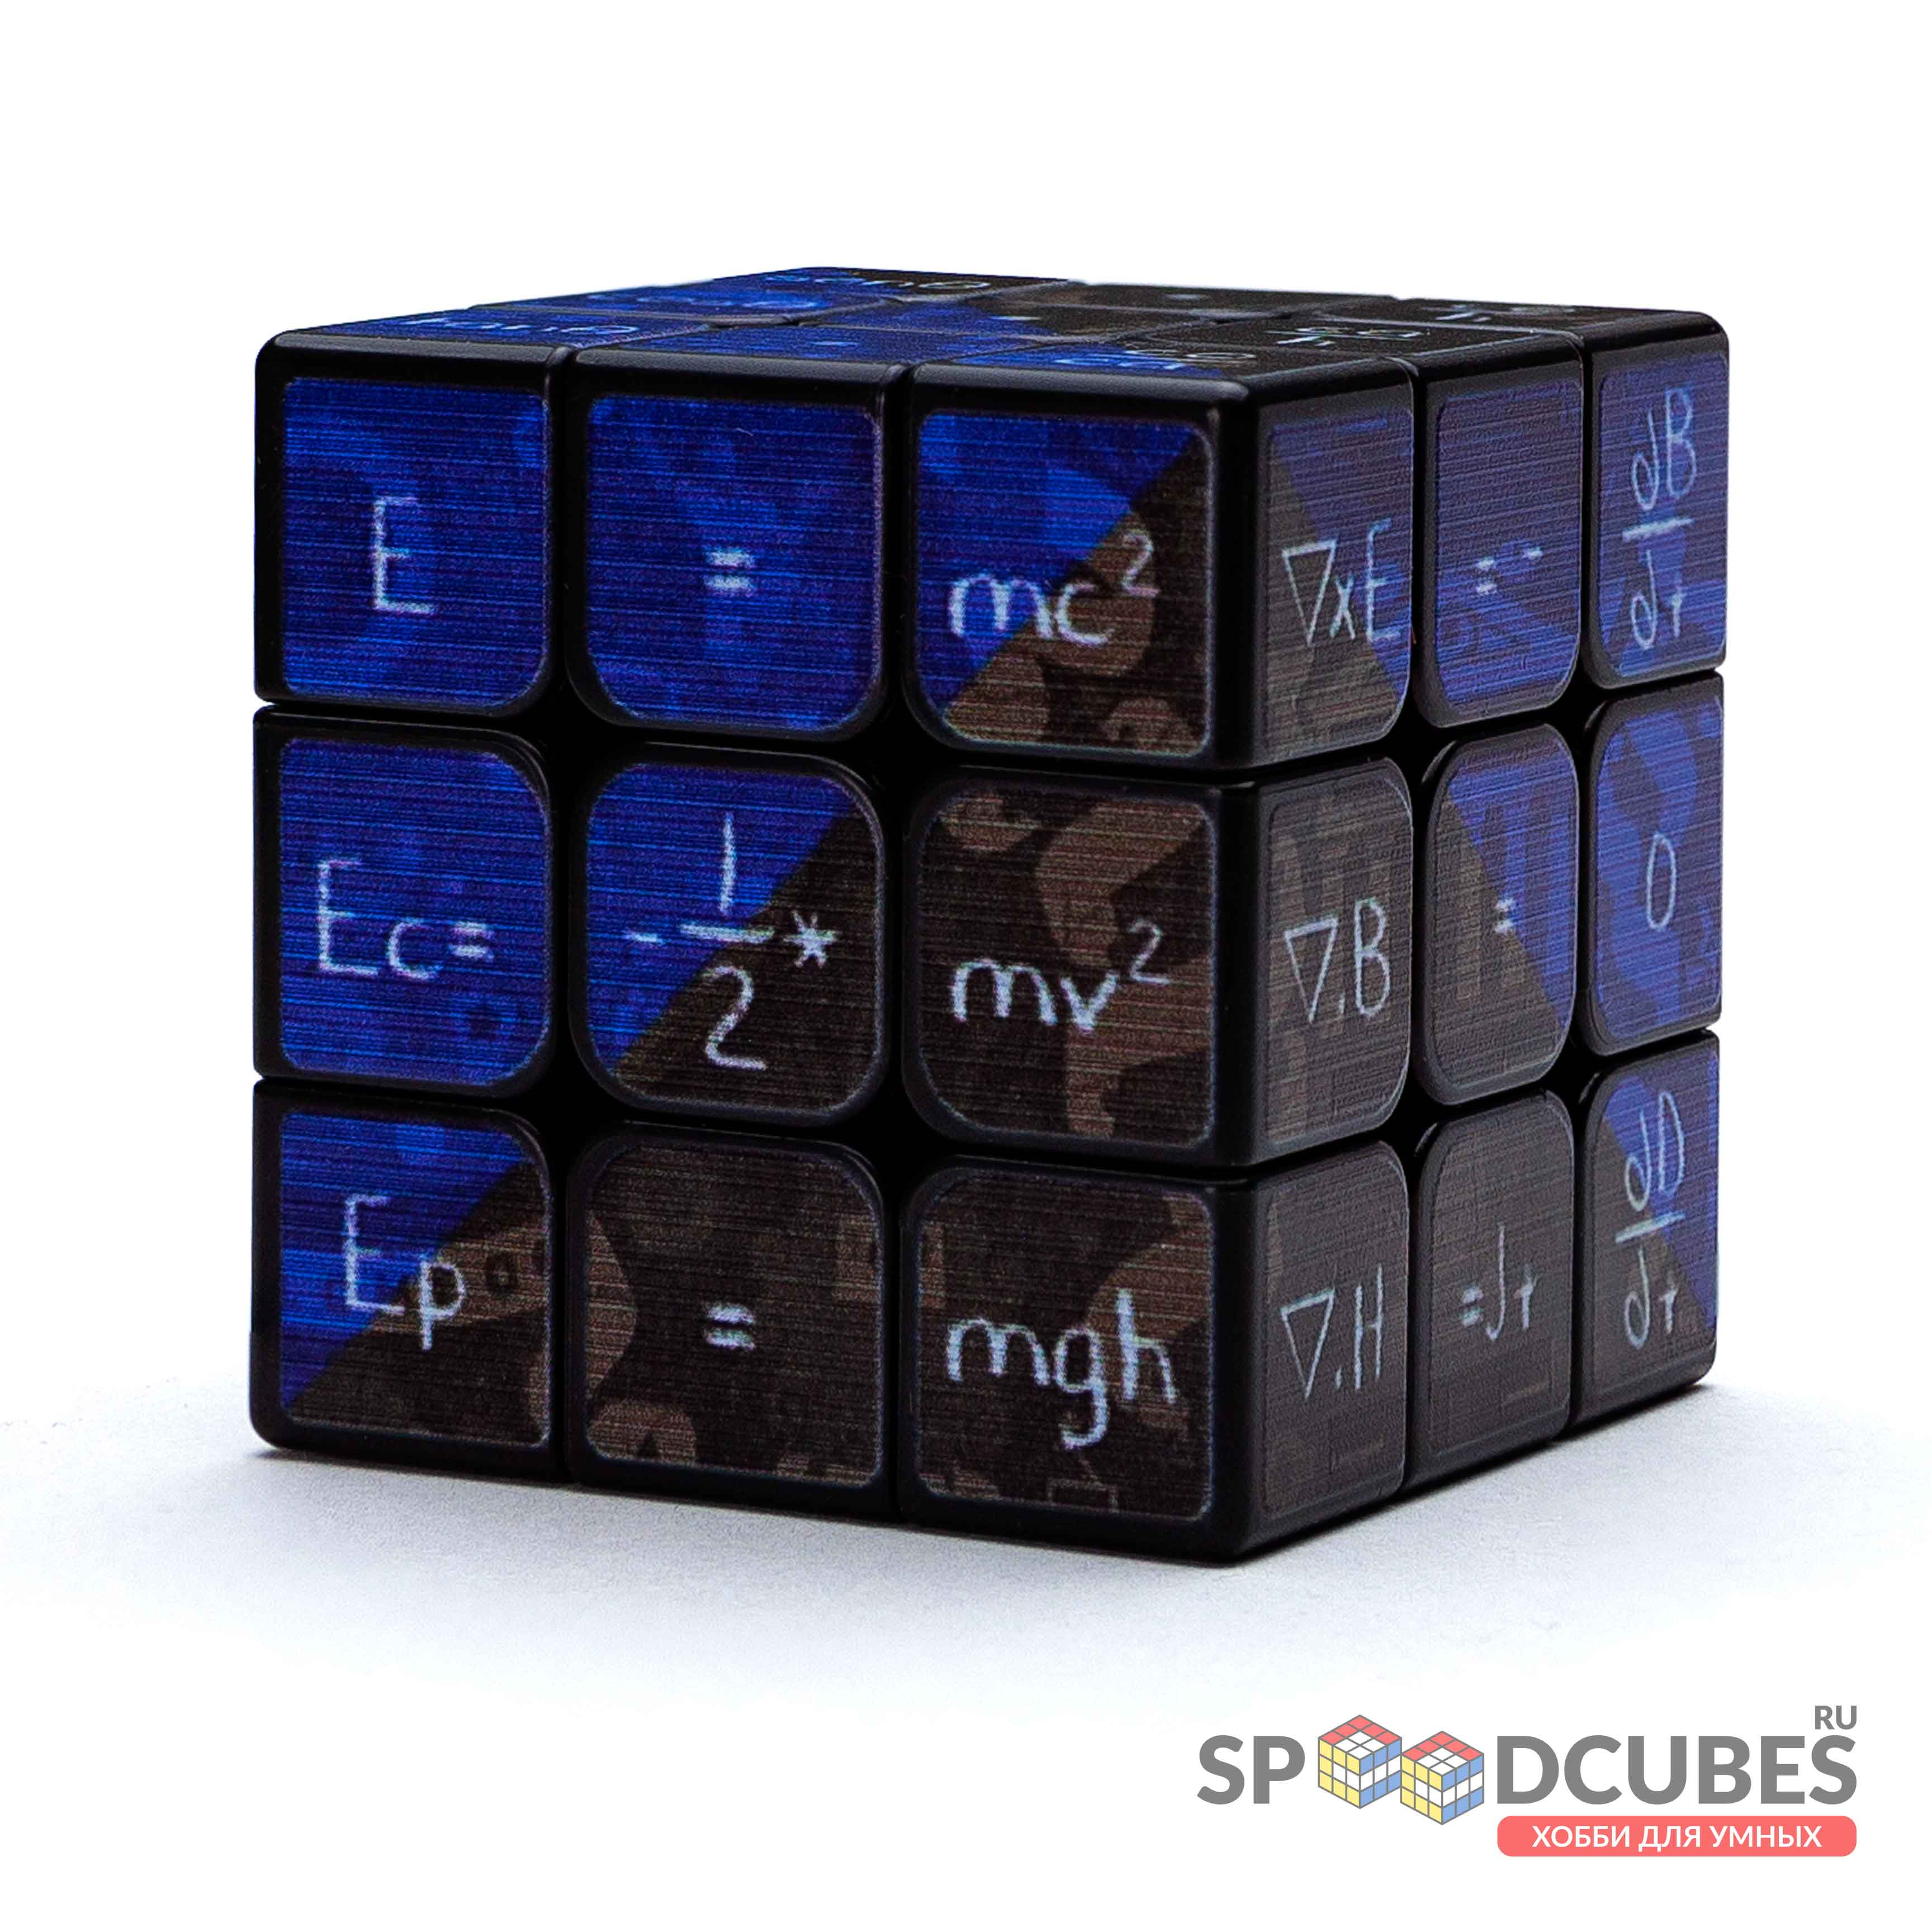 Z 3x3 Mathematics Cube